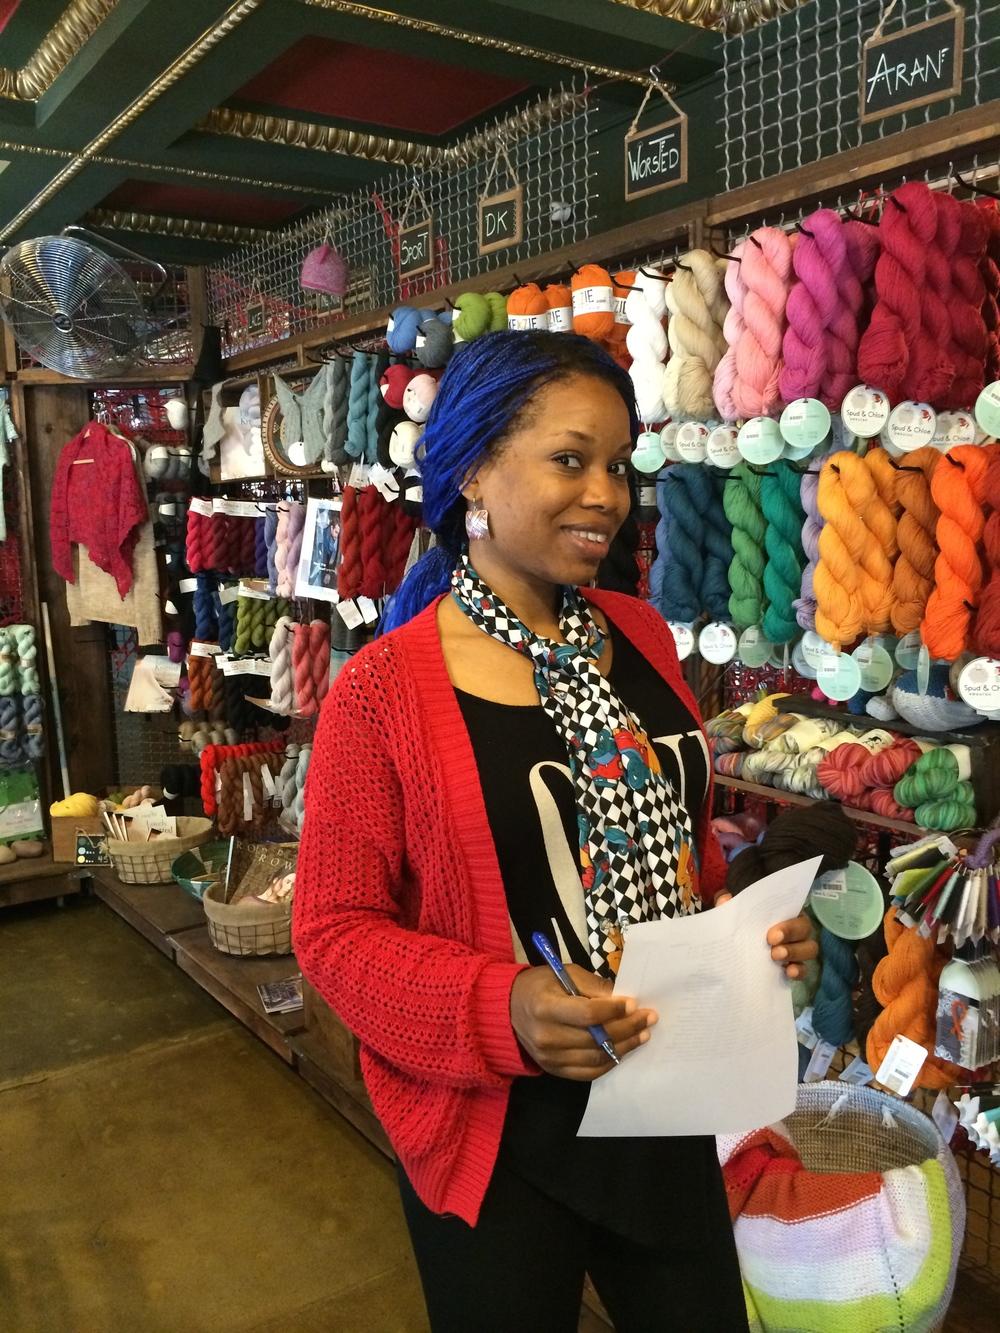 Yarn Shoppe